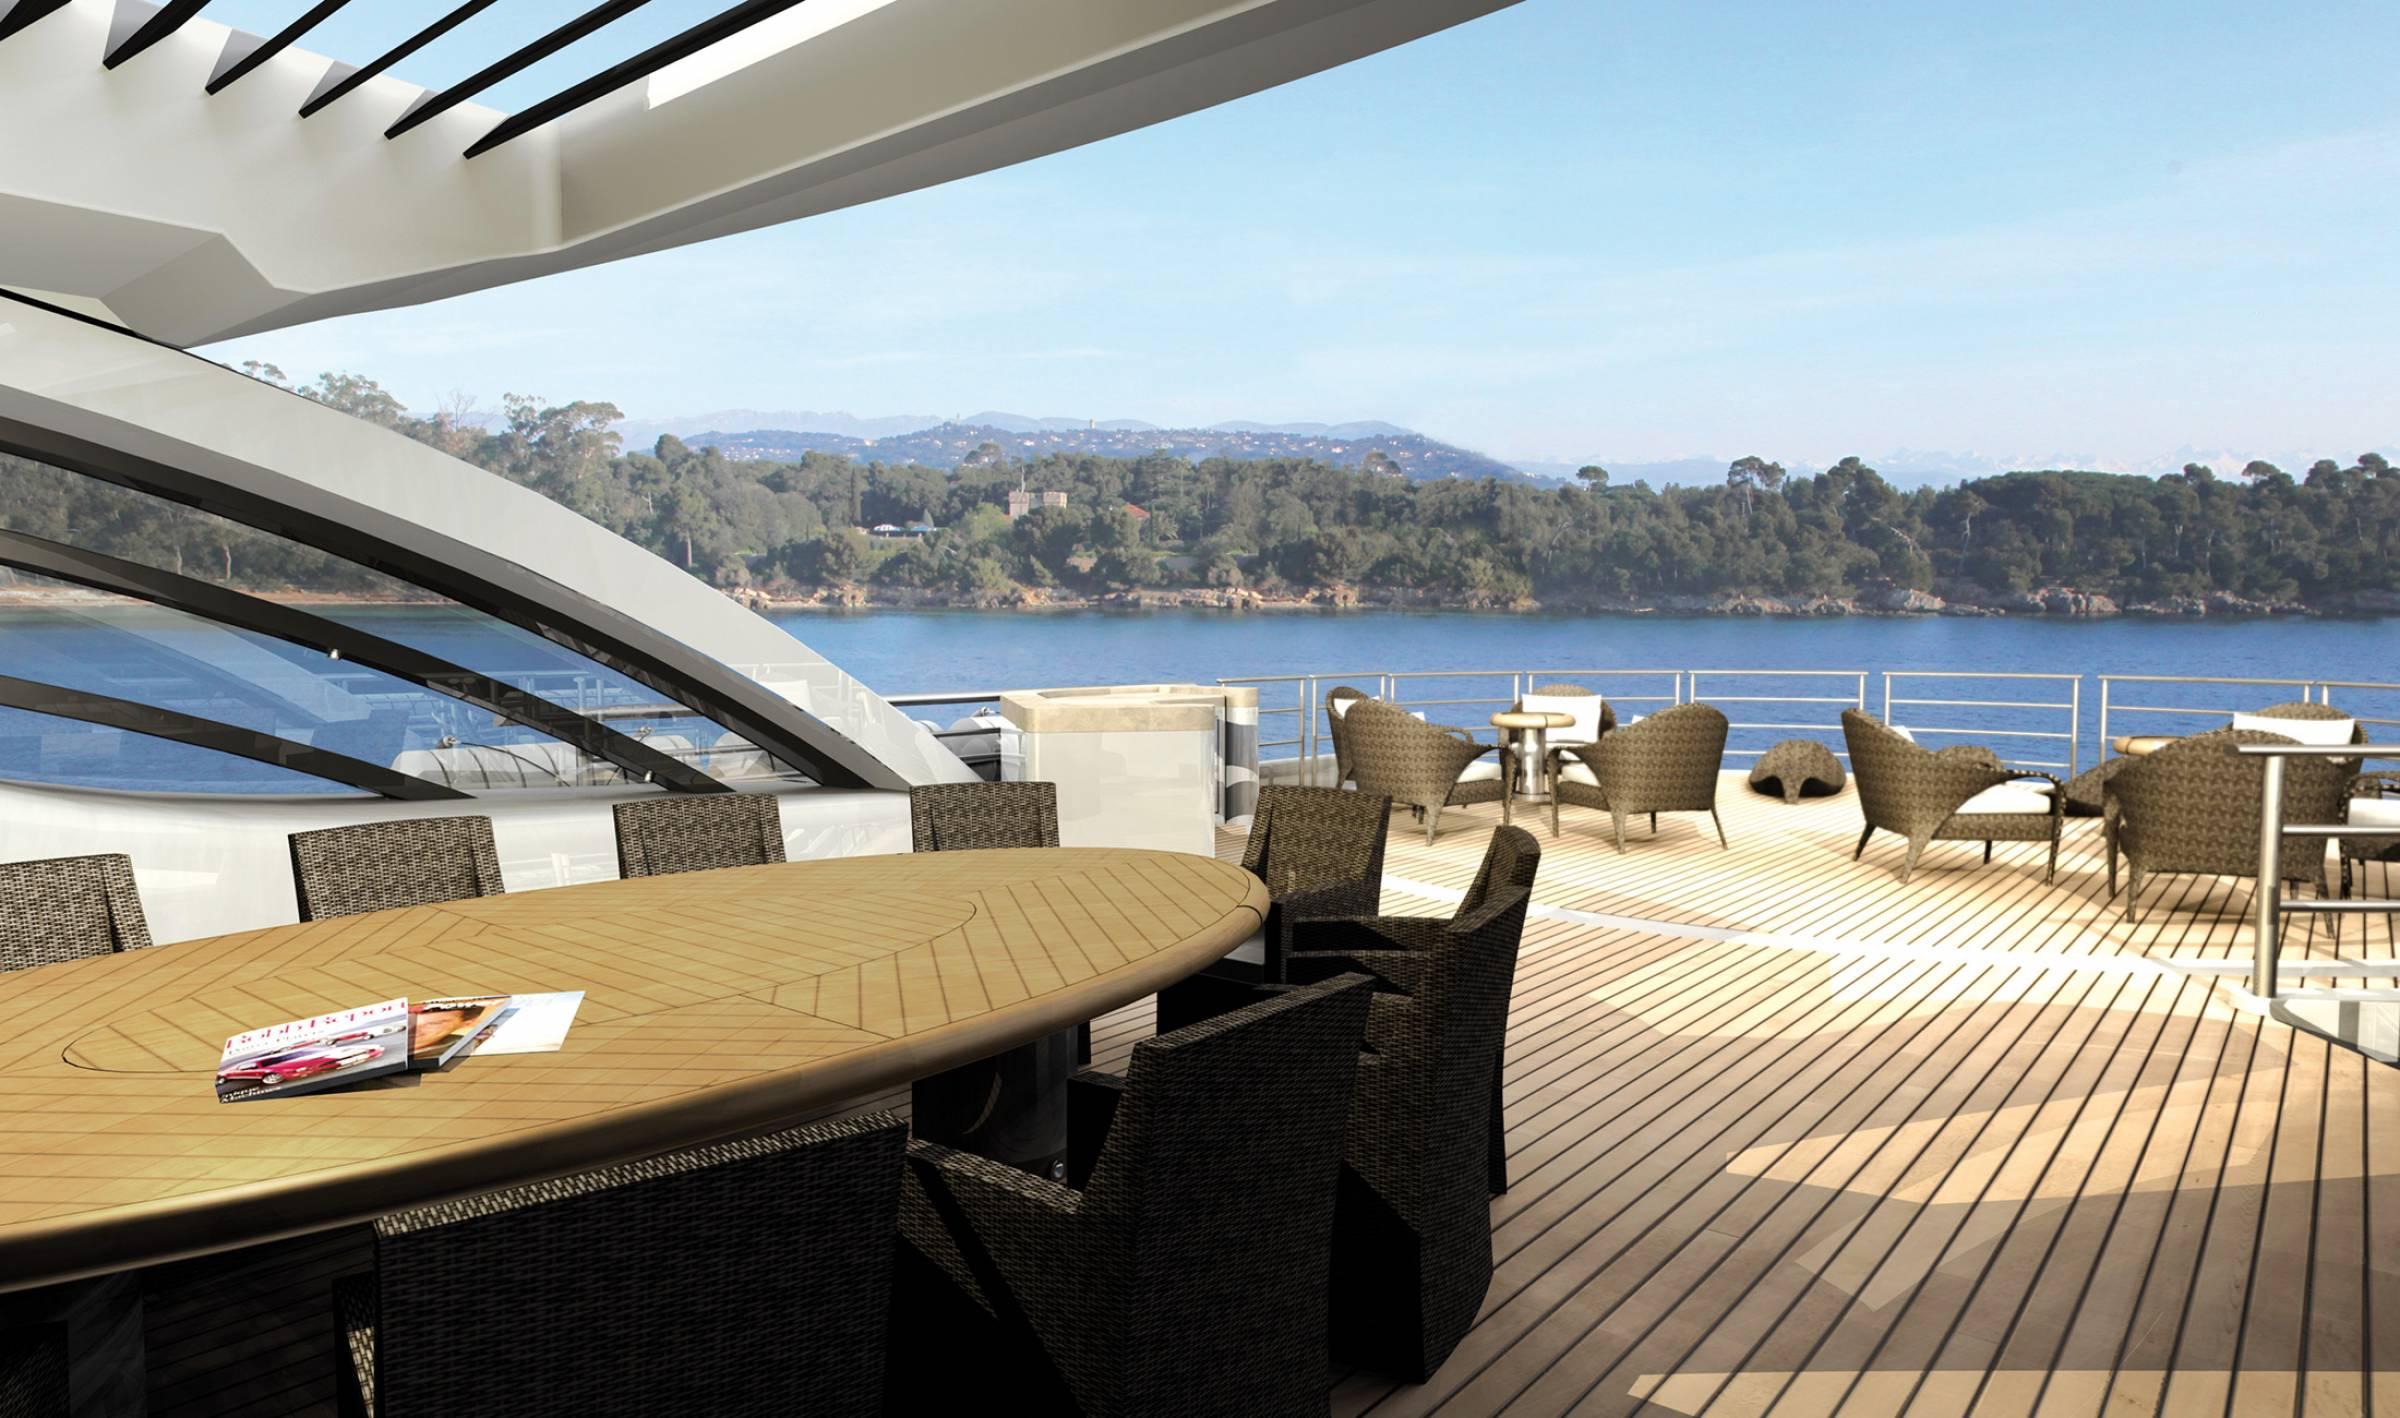 AMELS 212 Motor Yacht - Design Profile Rendering